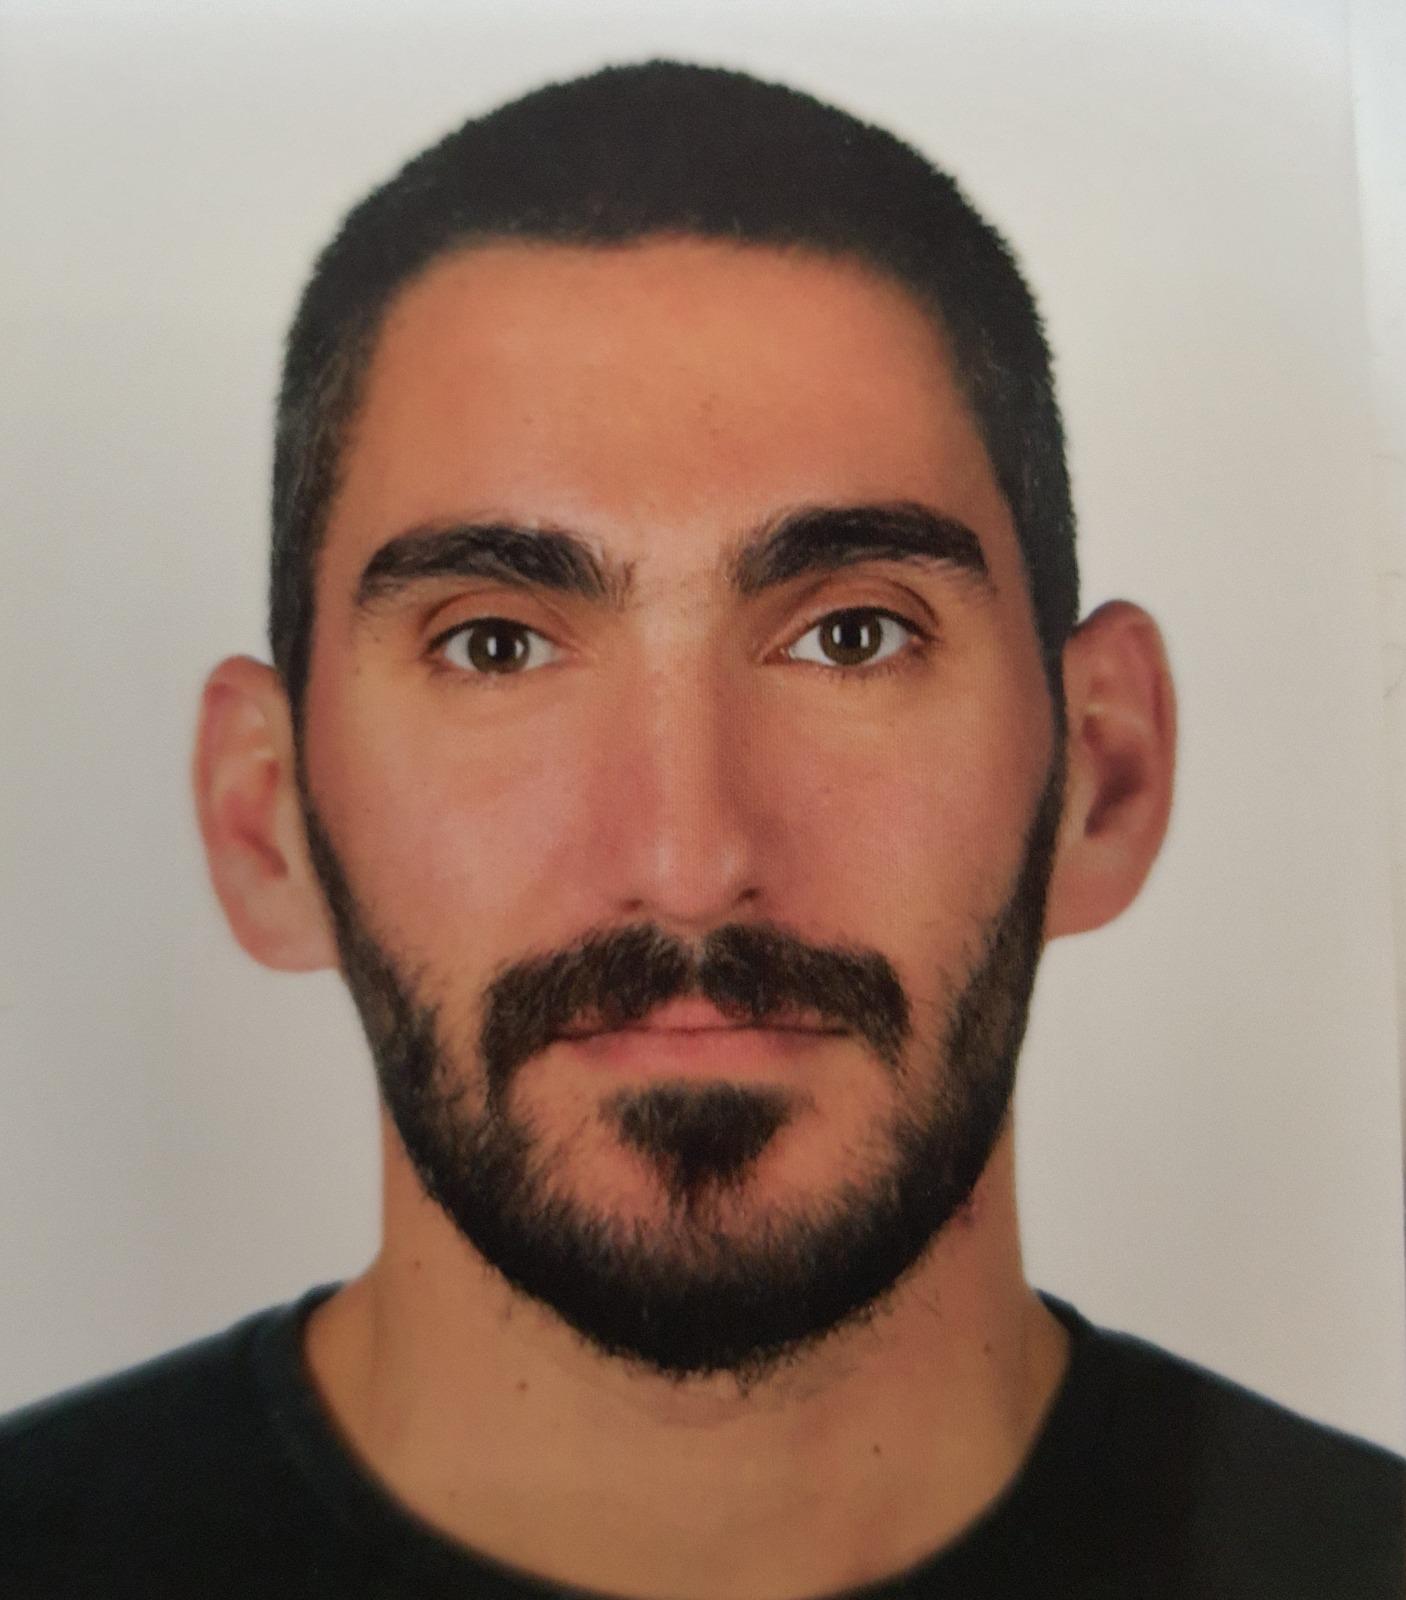 Ali Onur Şahinoğlu